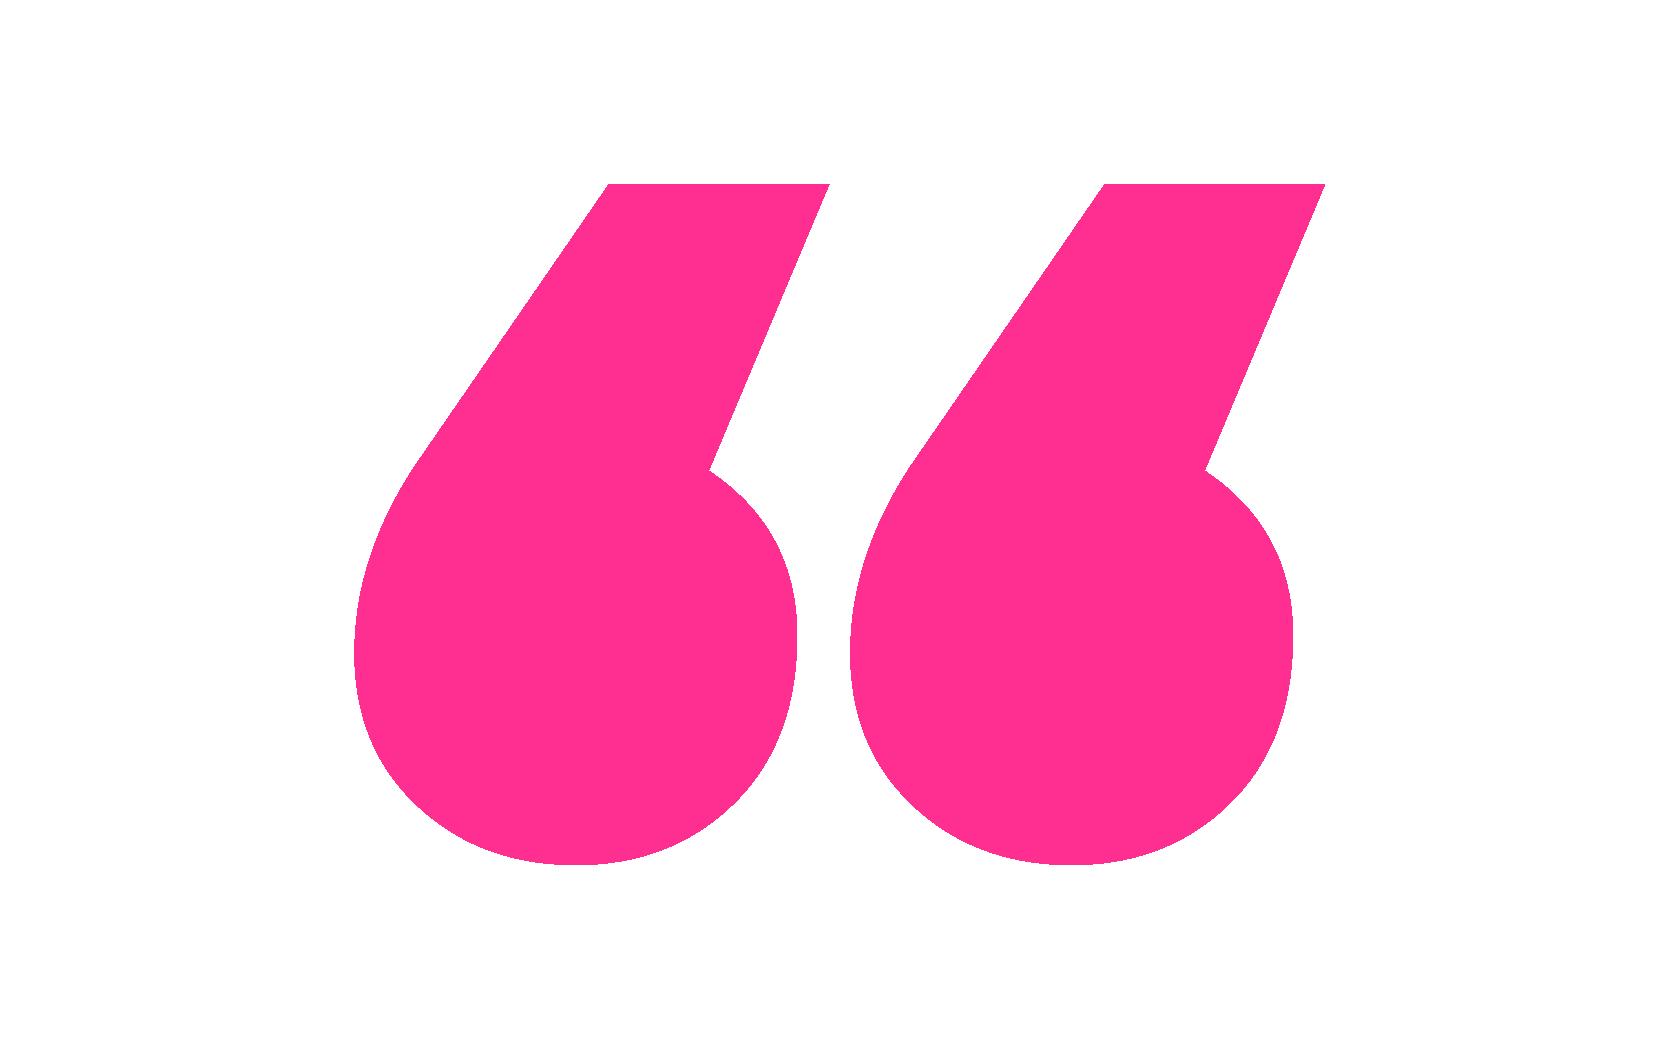 Villa_Web Icons_Inverted Commas_Small-13.png